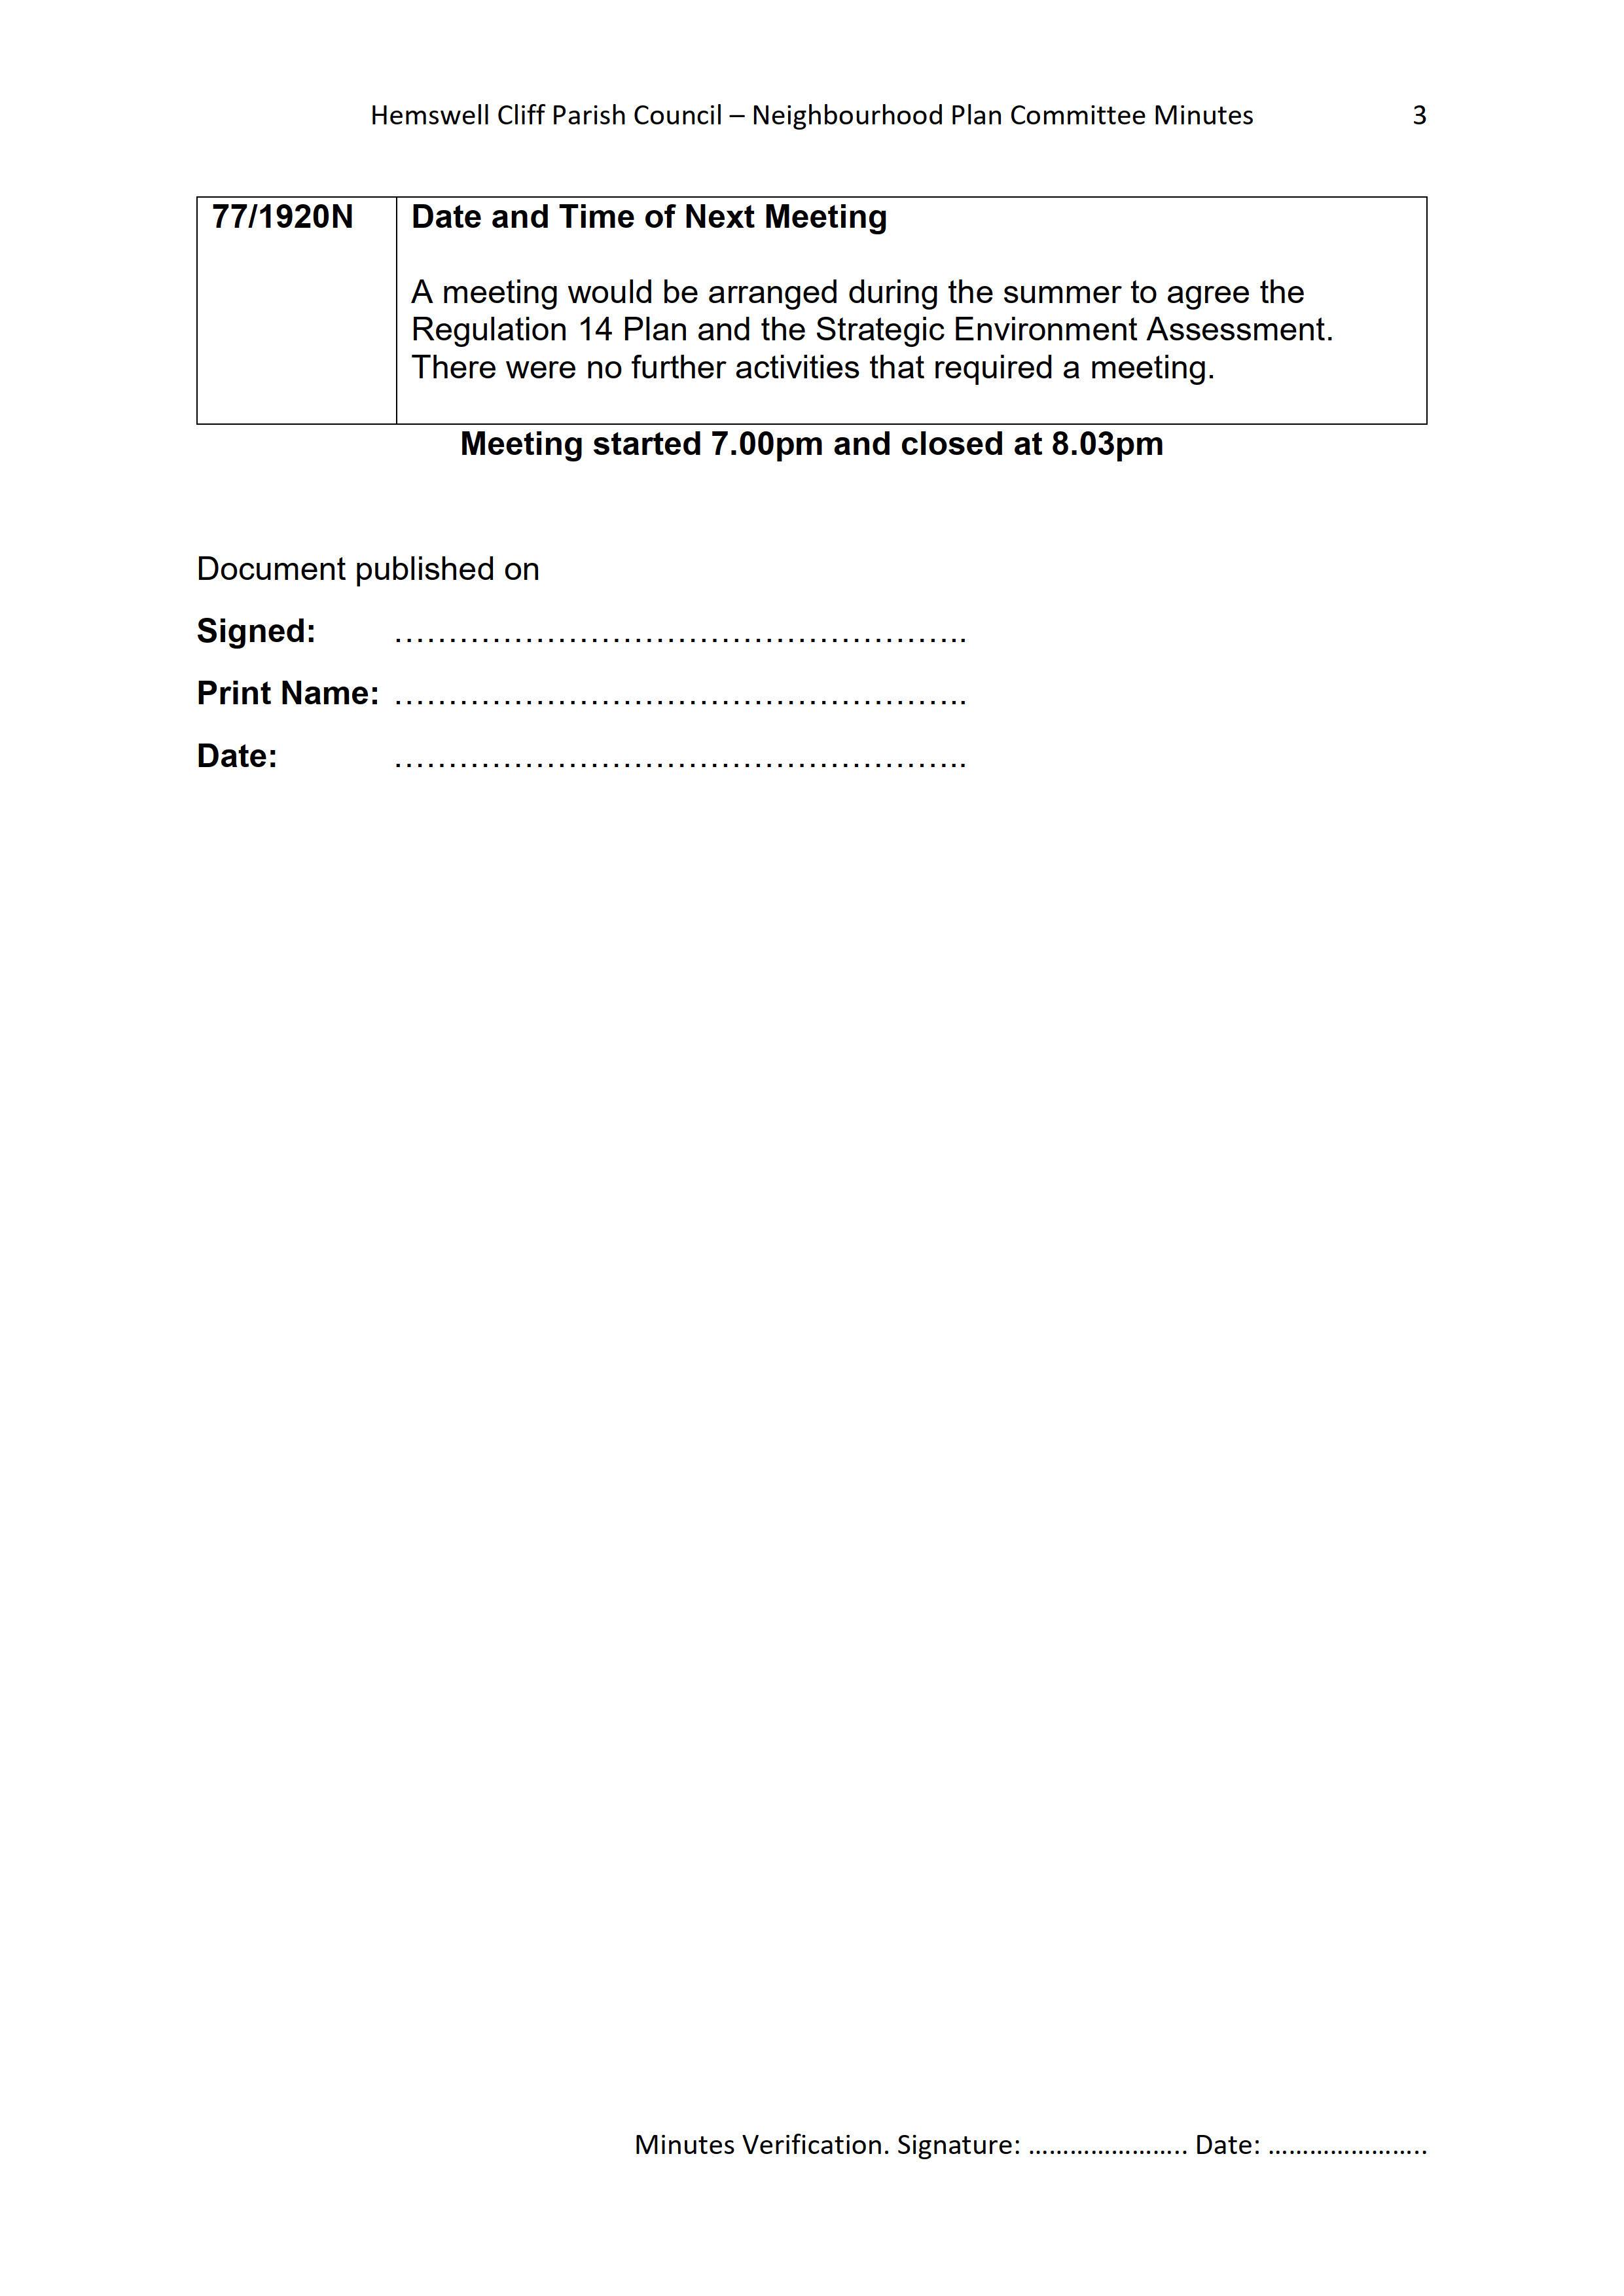 HCPC_NPC_Minutes_16.03.20_3.jpg